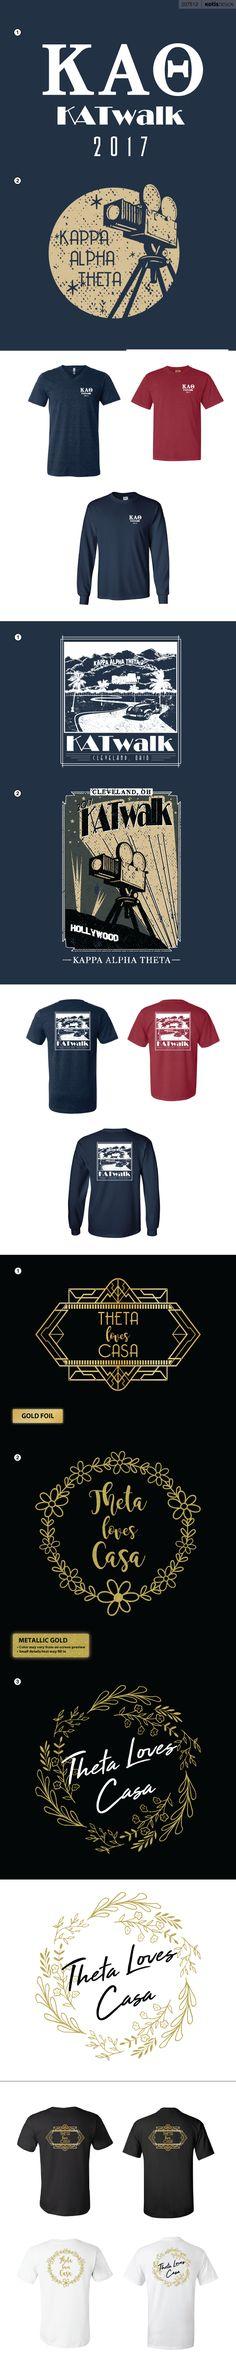 207512 - CWRU Kappa Alpha Theta   Philanthropy '17 - View Proof - Kotis Design